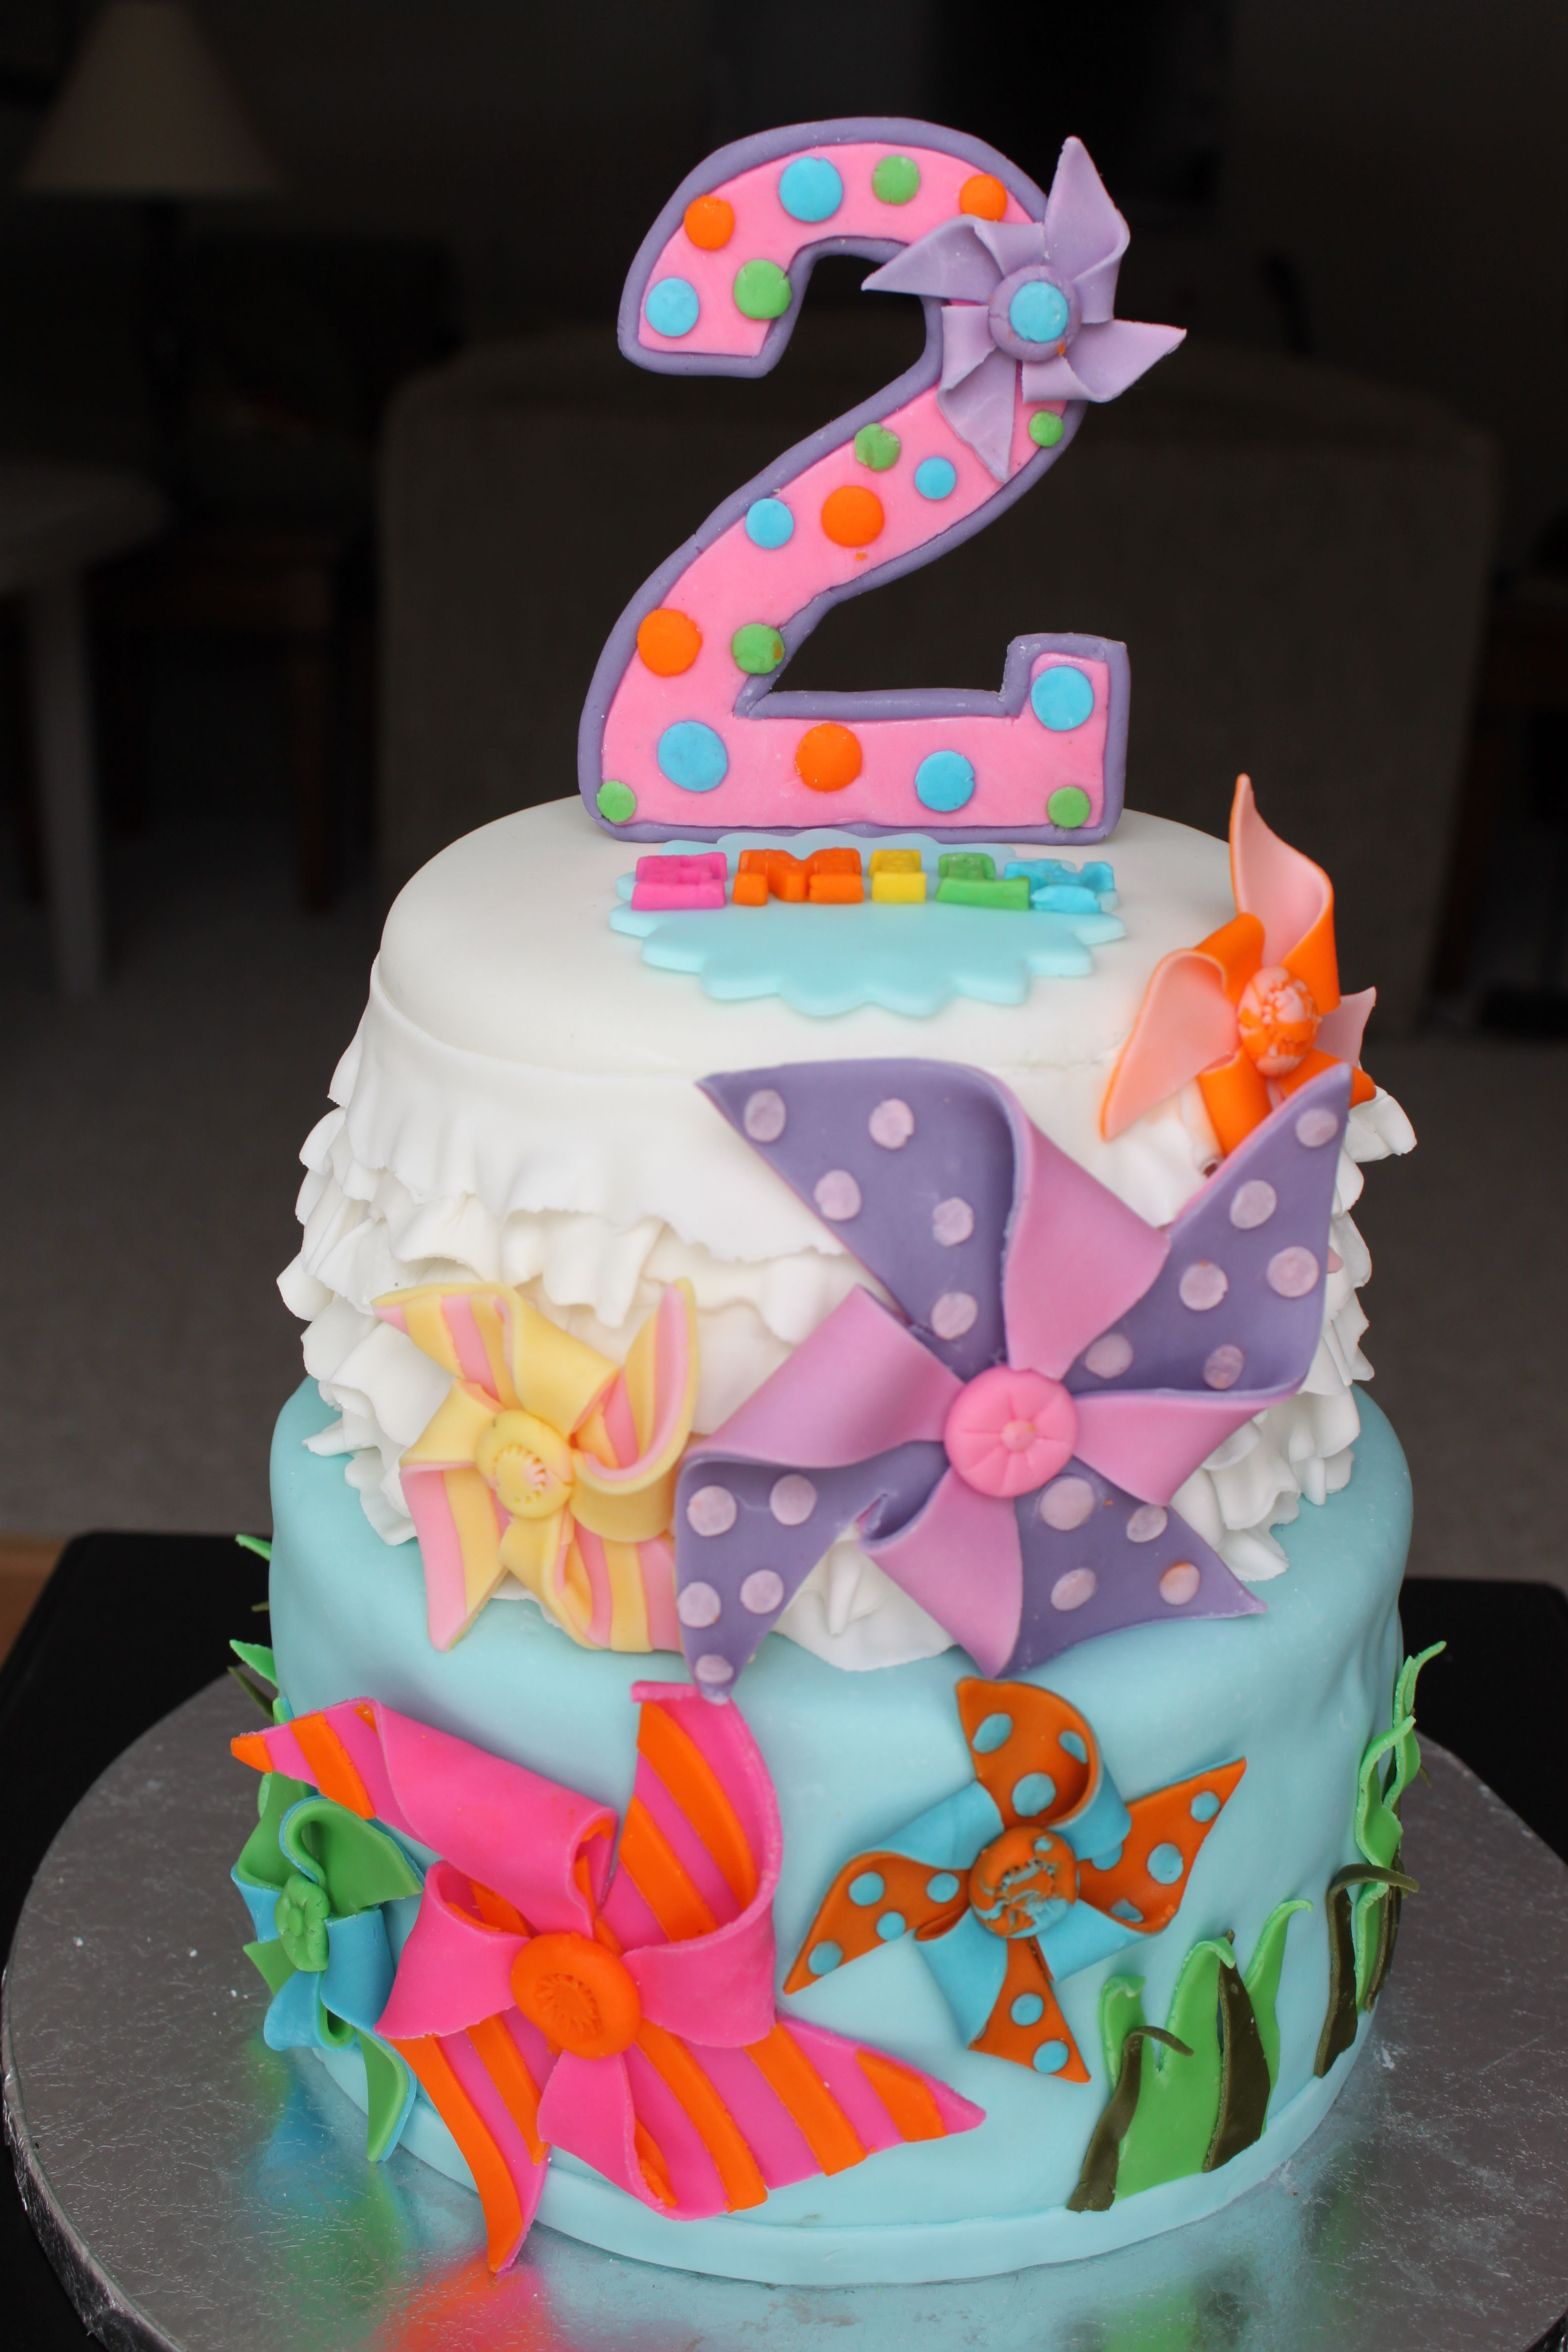 2 Year Old Birthday Cake : birthday, Children's, Birthday, Cakes, Cake,, Photo,